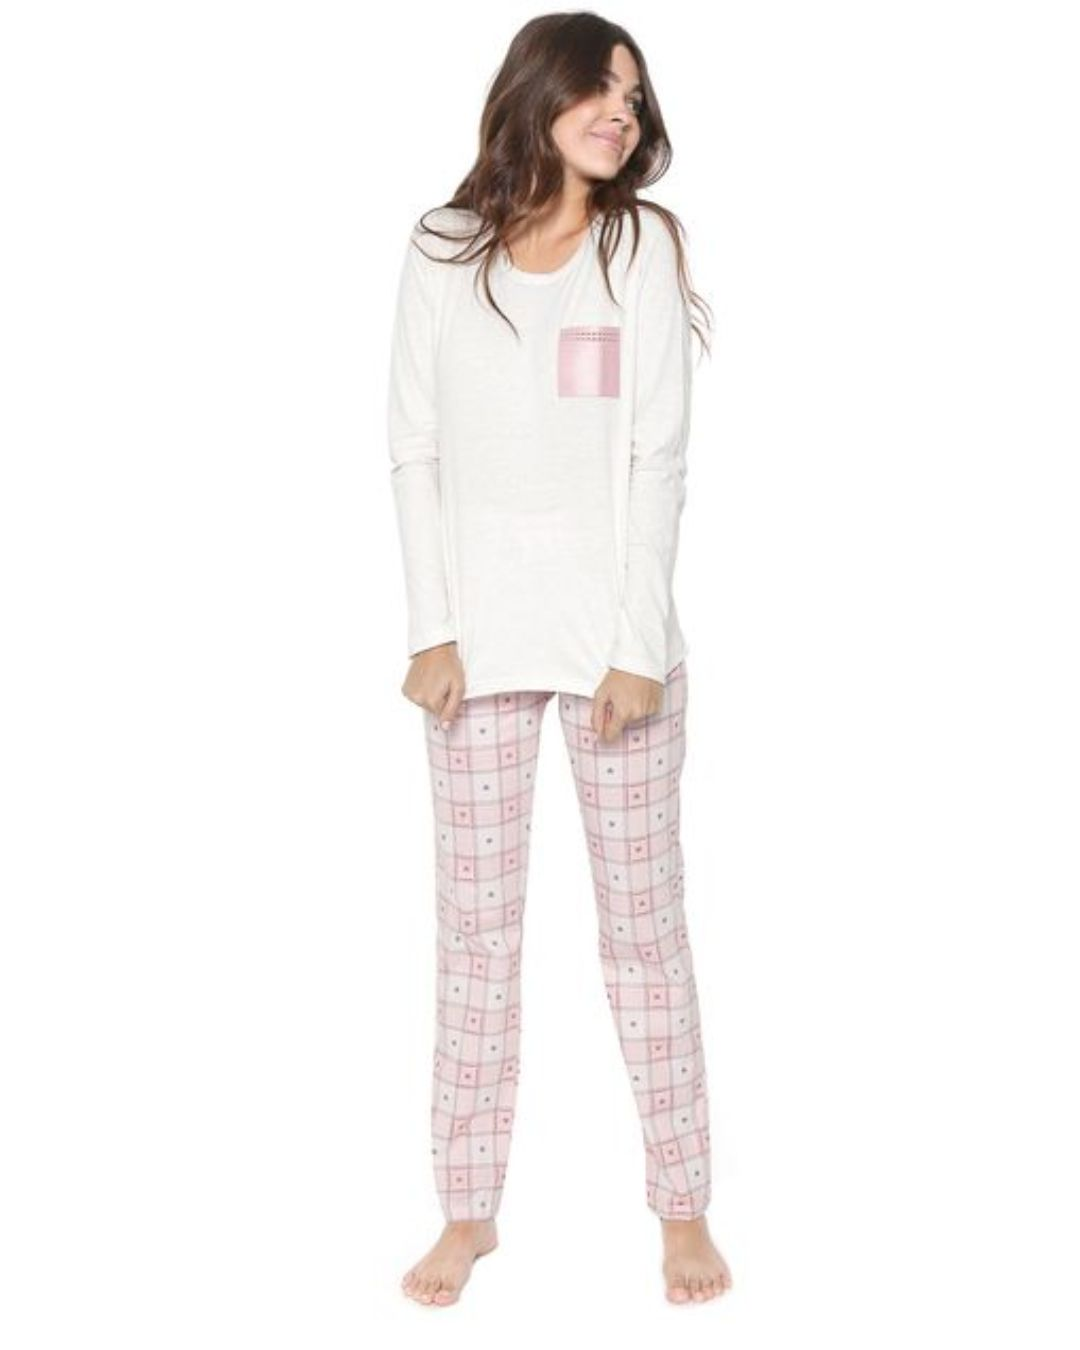 Pijama Manga Longa Rosa Candy Cor com Amor 10914